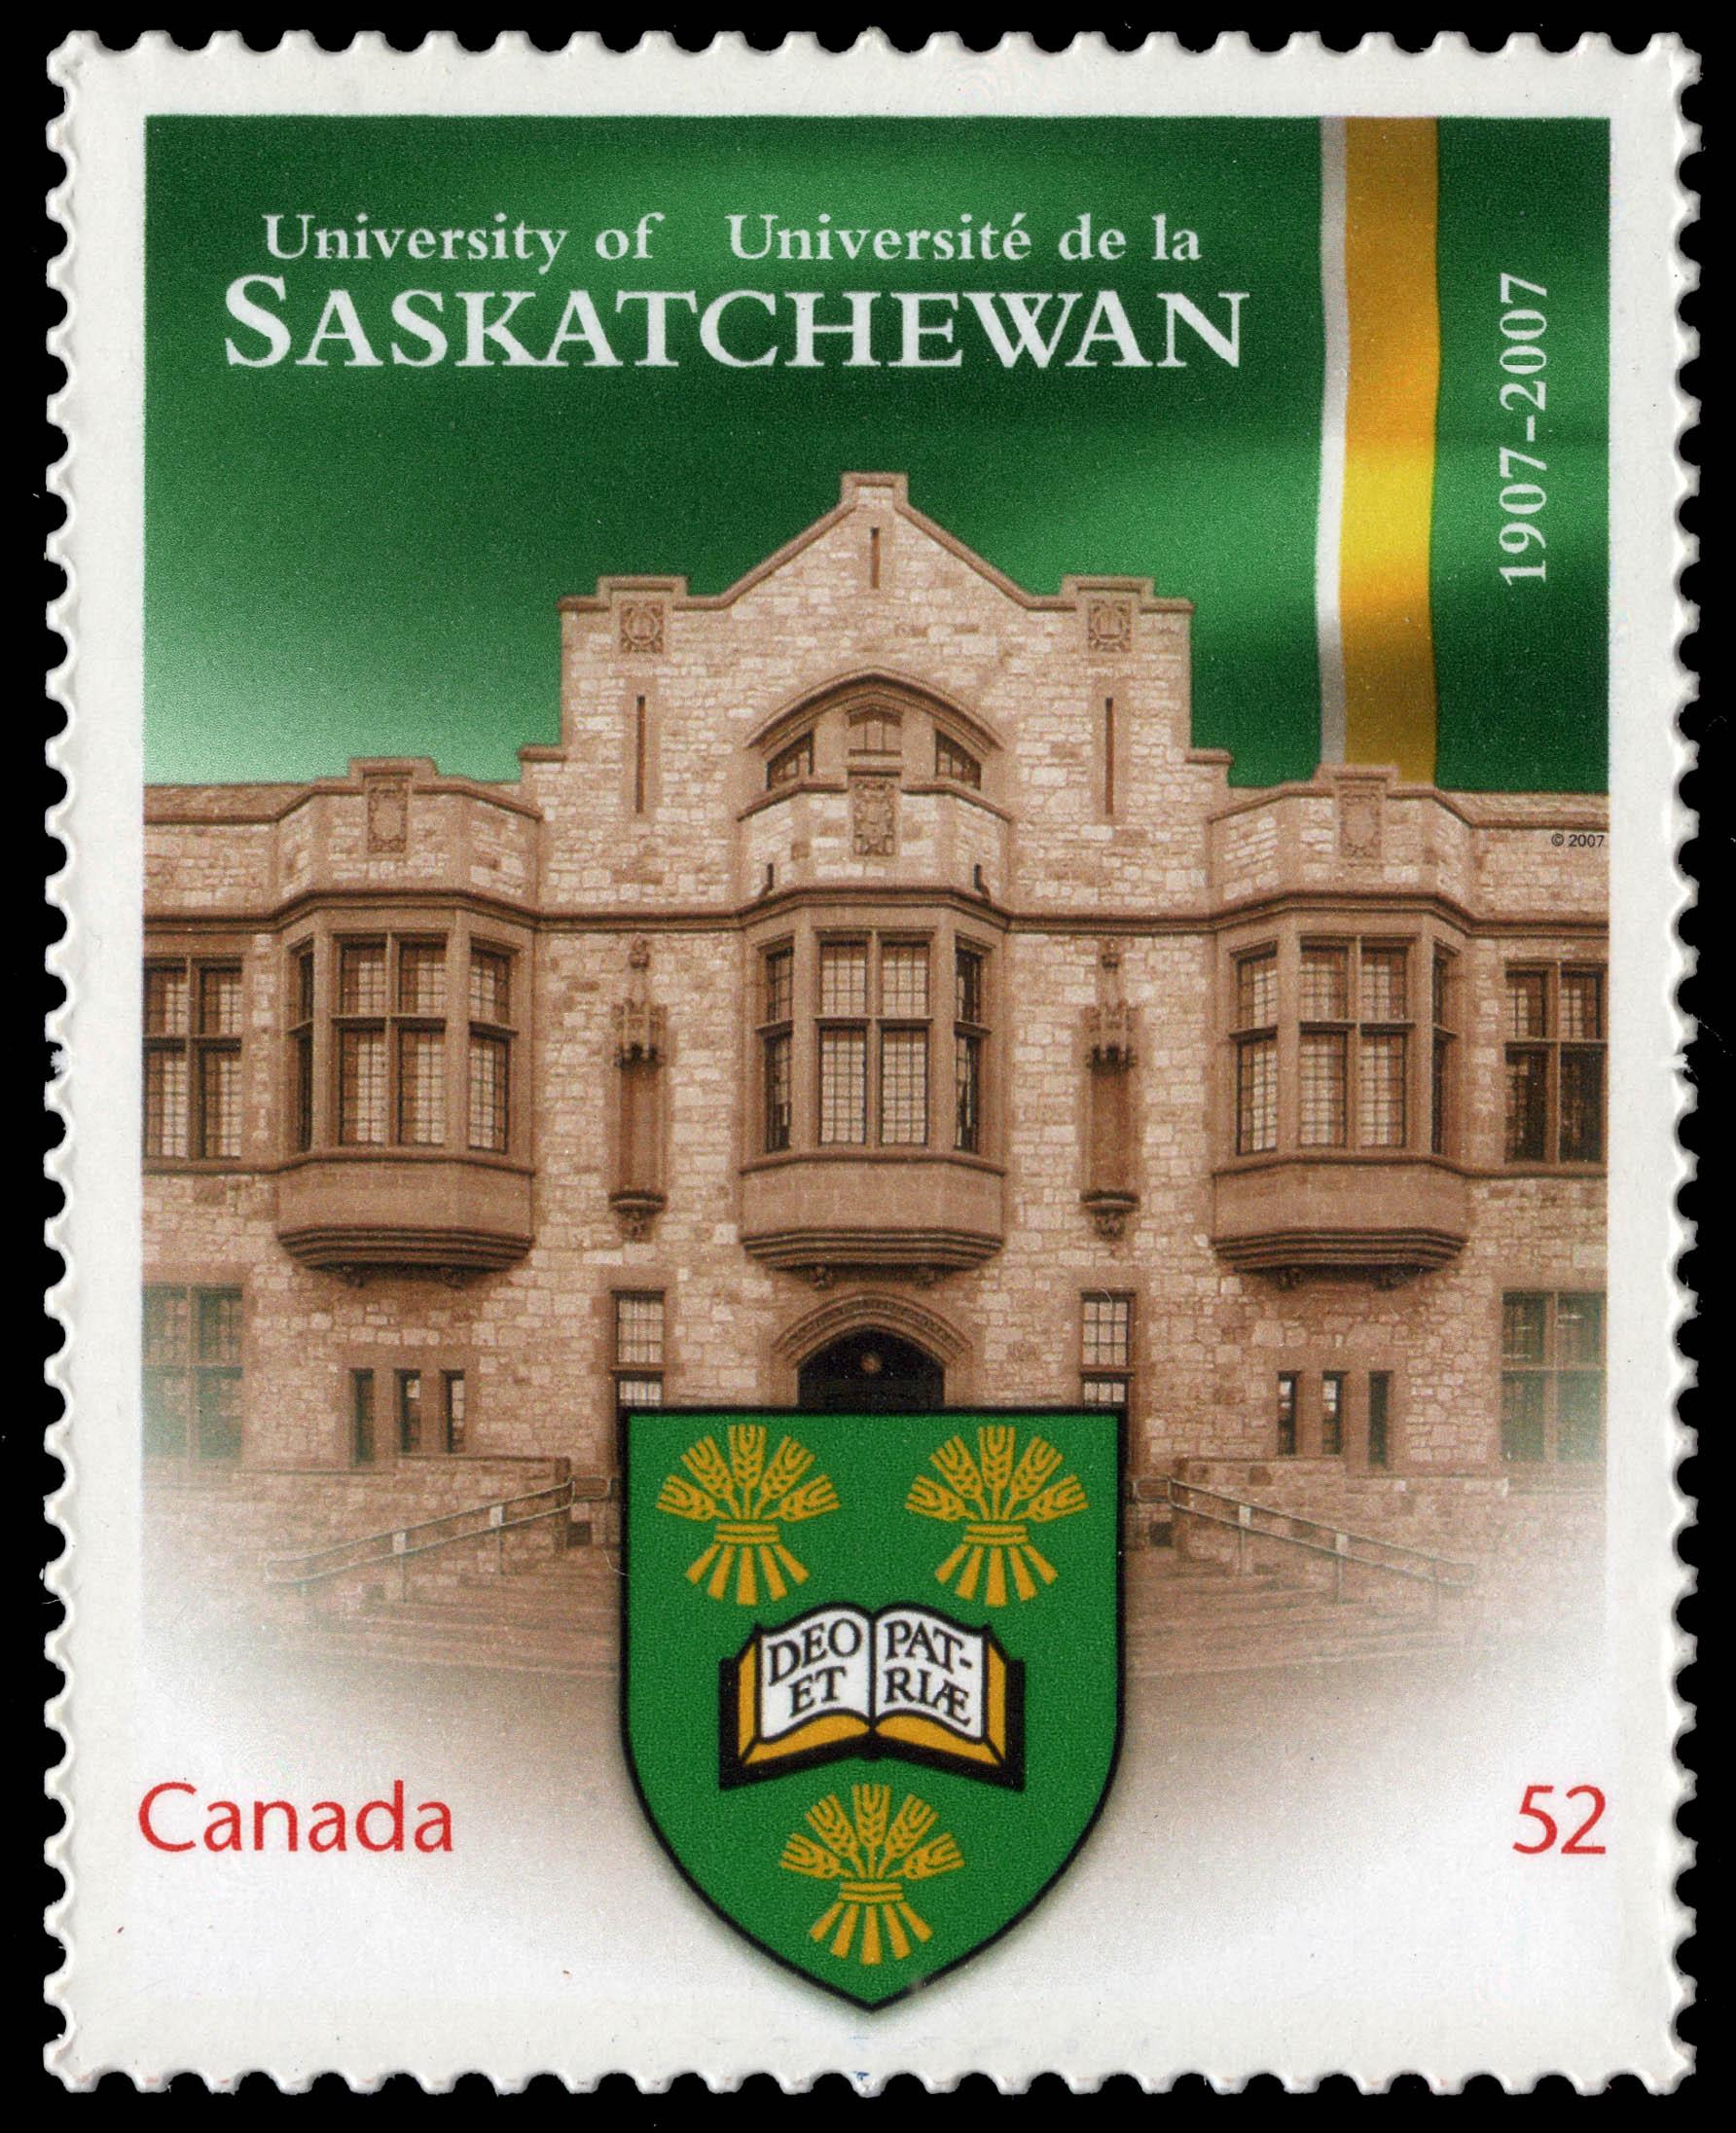 University of Saskatchewan - 1907-2007 Canada Postage Stamp | Canadian Universities